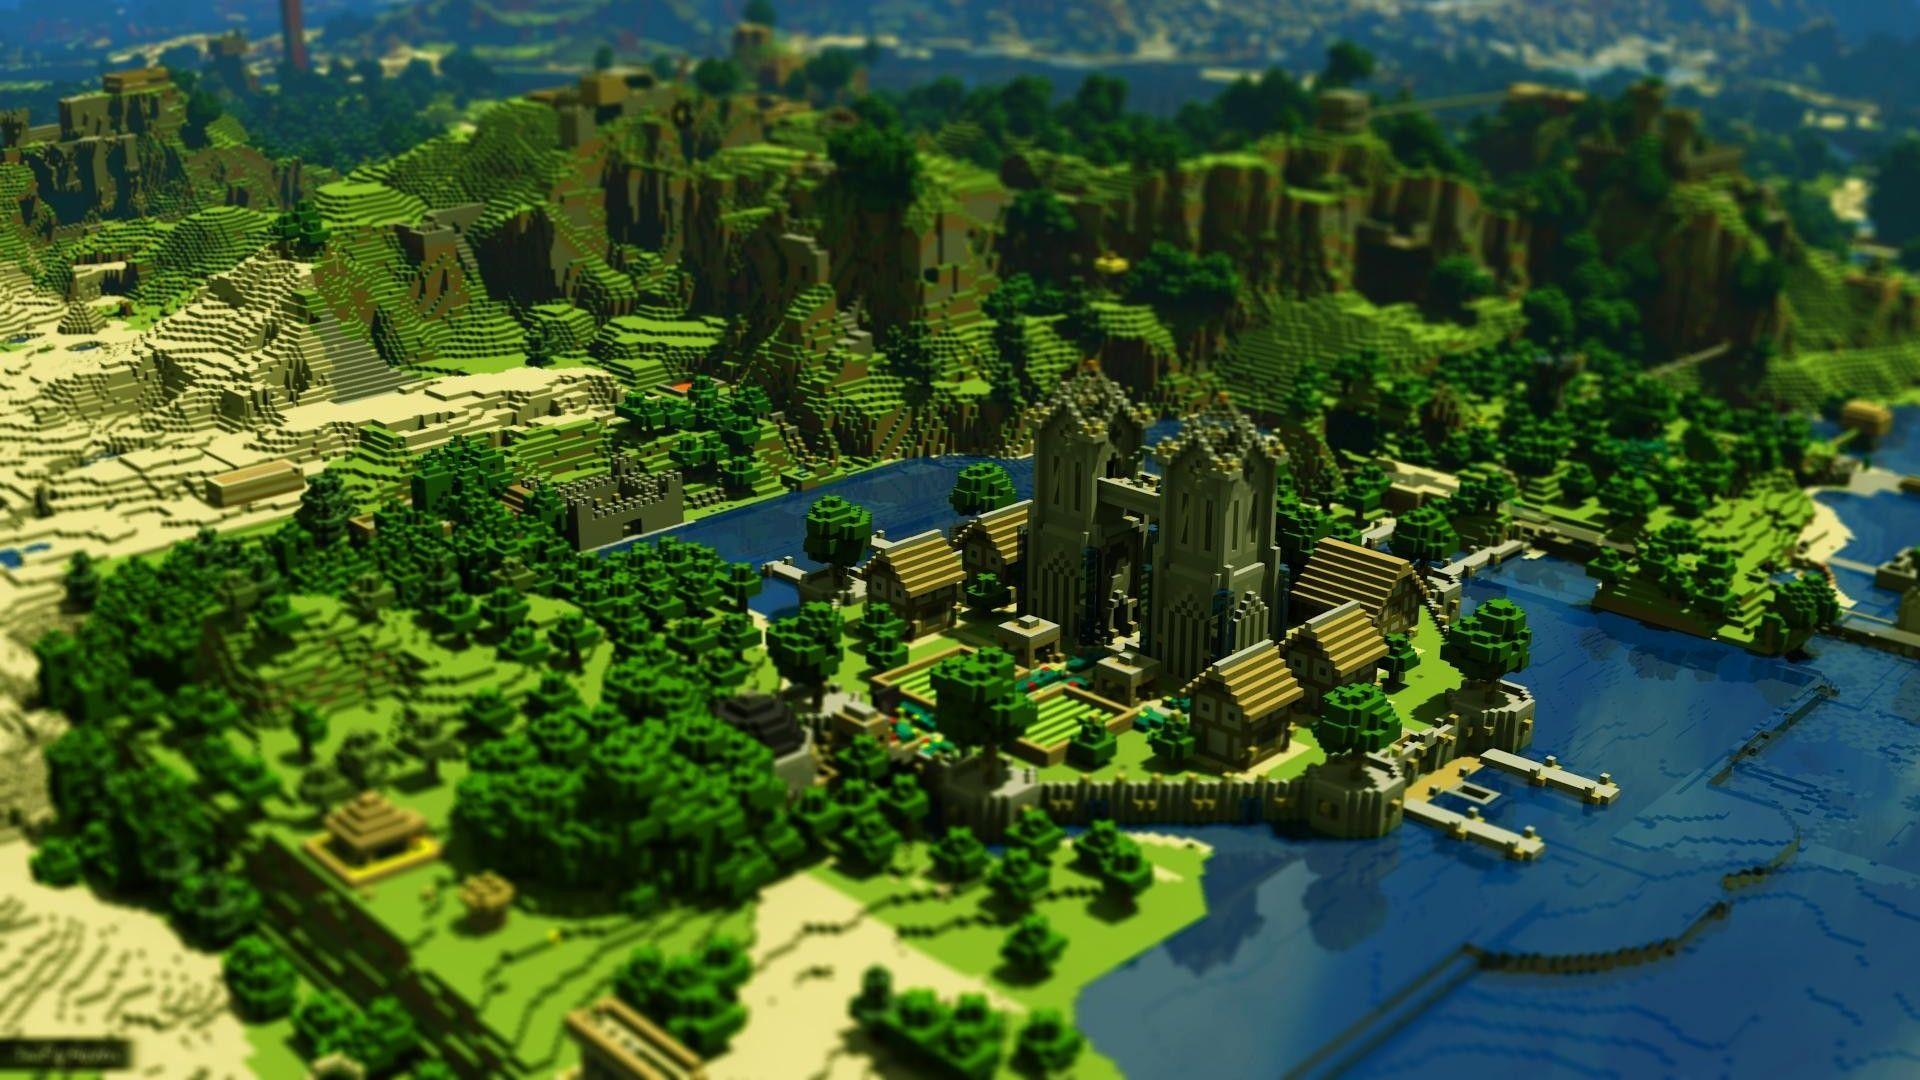 Fantastic Wallpaper Minecraft Google - 9607feb577791b9e1ffb96735da8f01a  Photograph_573977.jpg